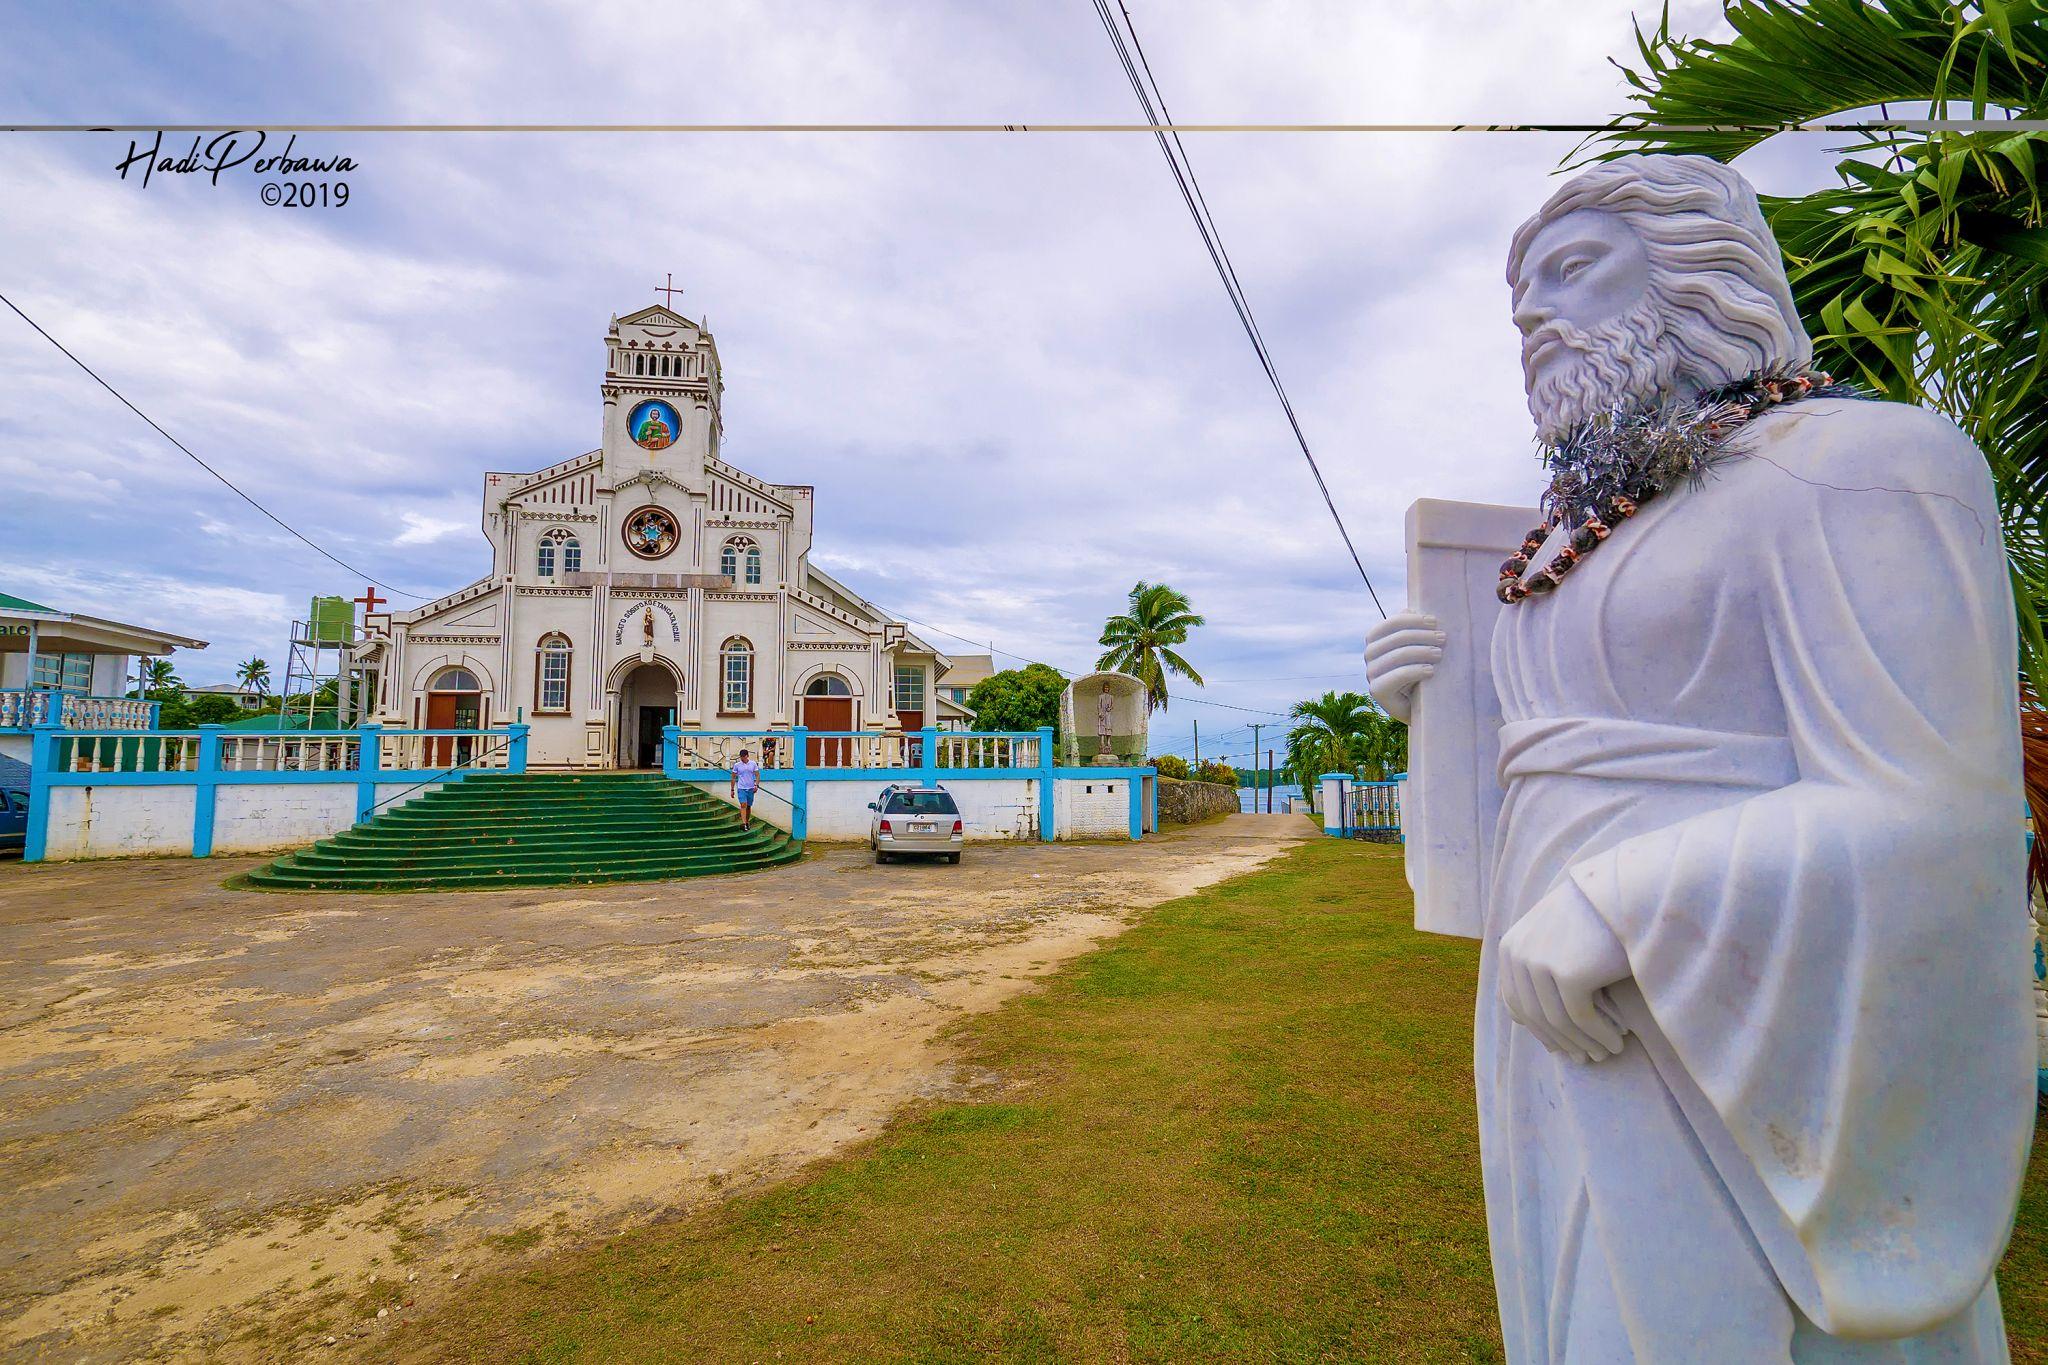 St Joseph's Cathedral Neiafu-Tonga, Tonga